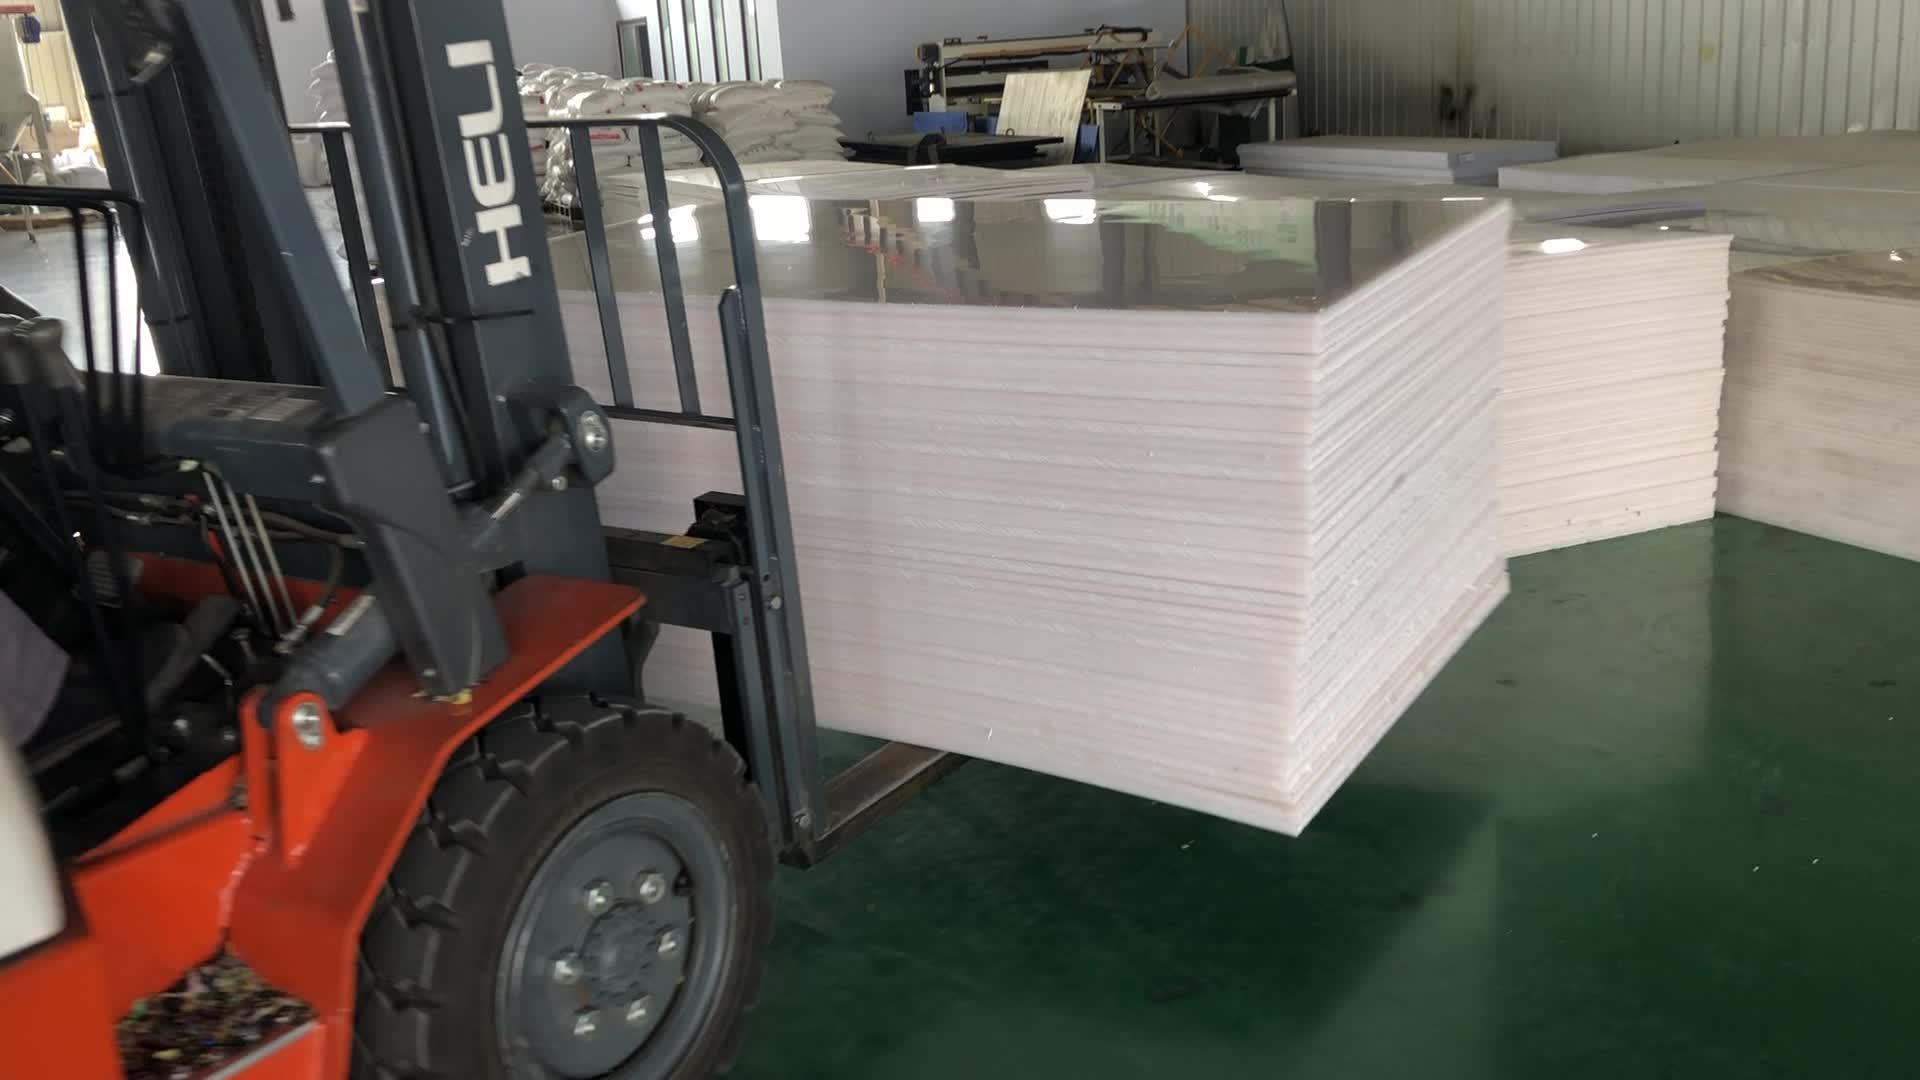 China No 1 Pabrik untuk Plastik HDPE Lembaran Uhmwpe Lembaran Plastik dan Plastik PP Sheet